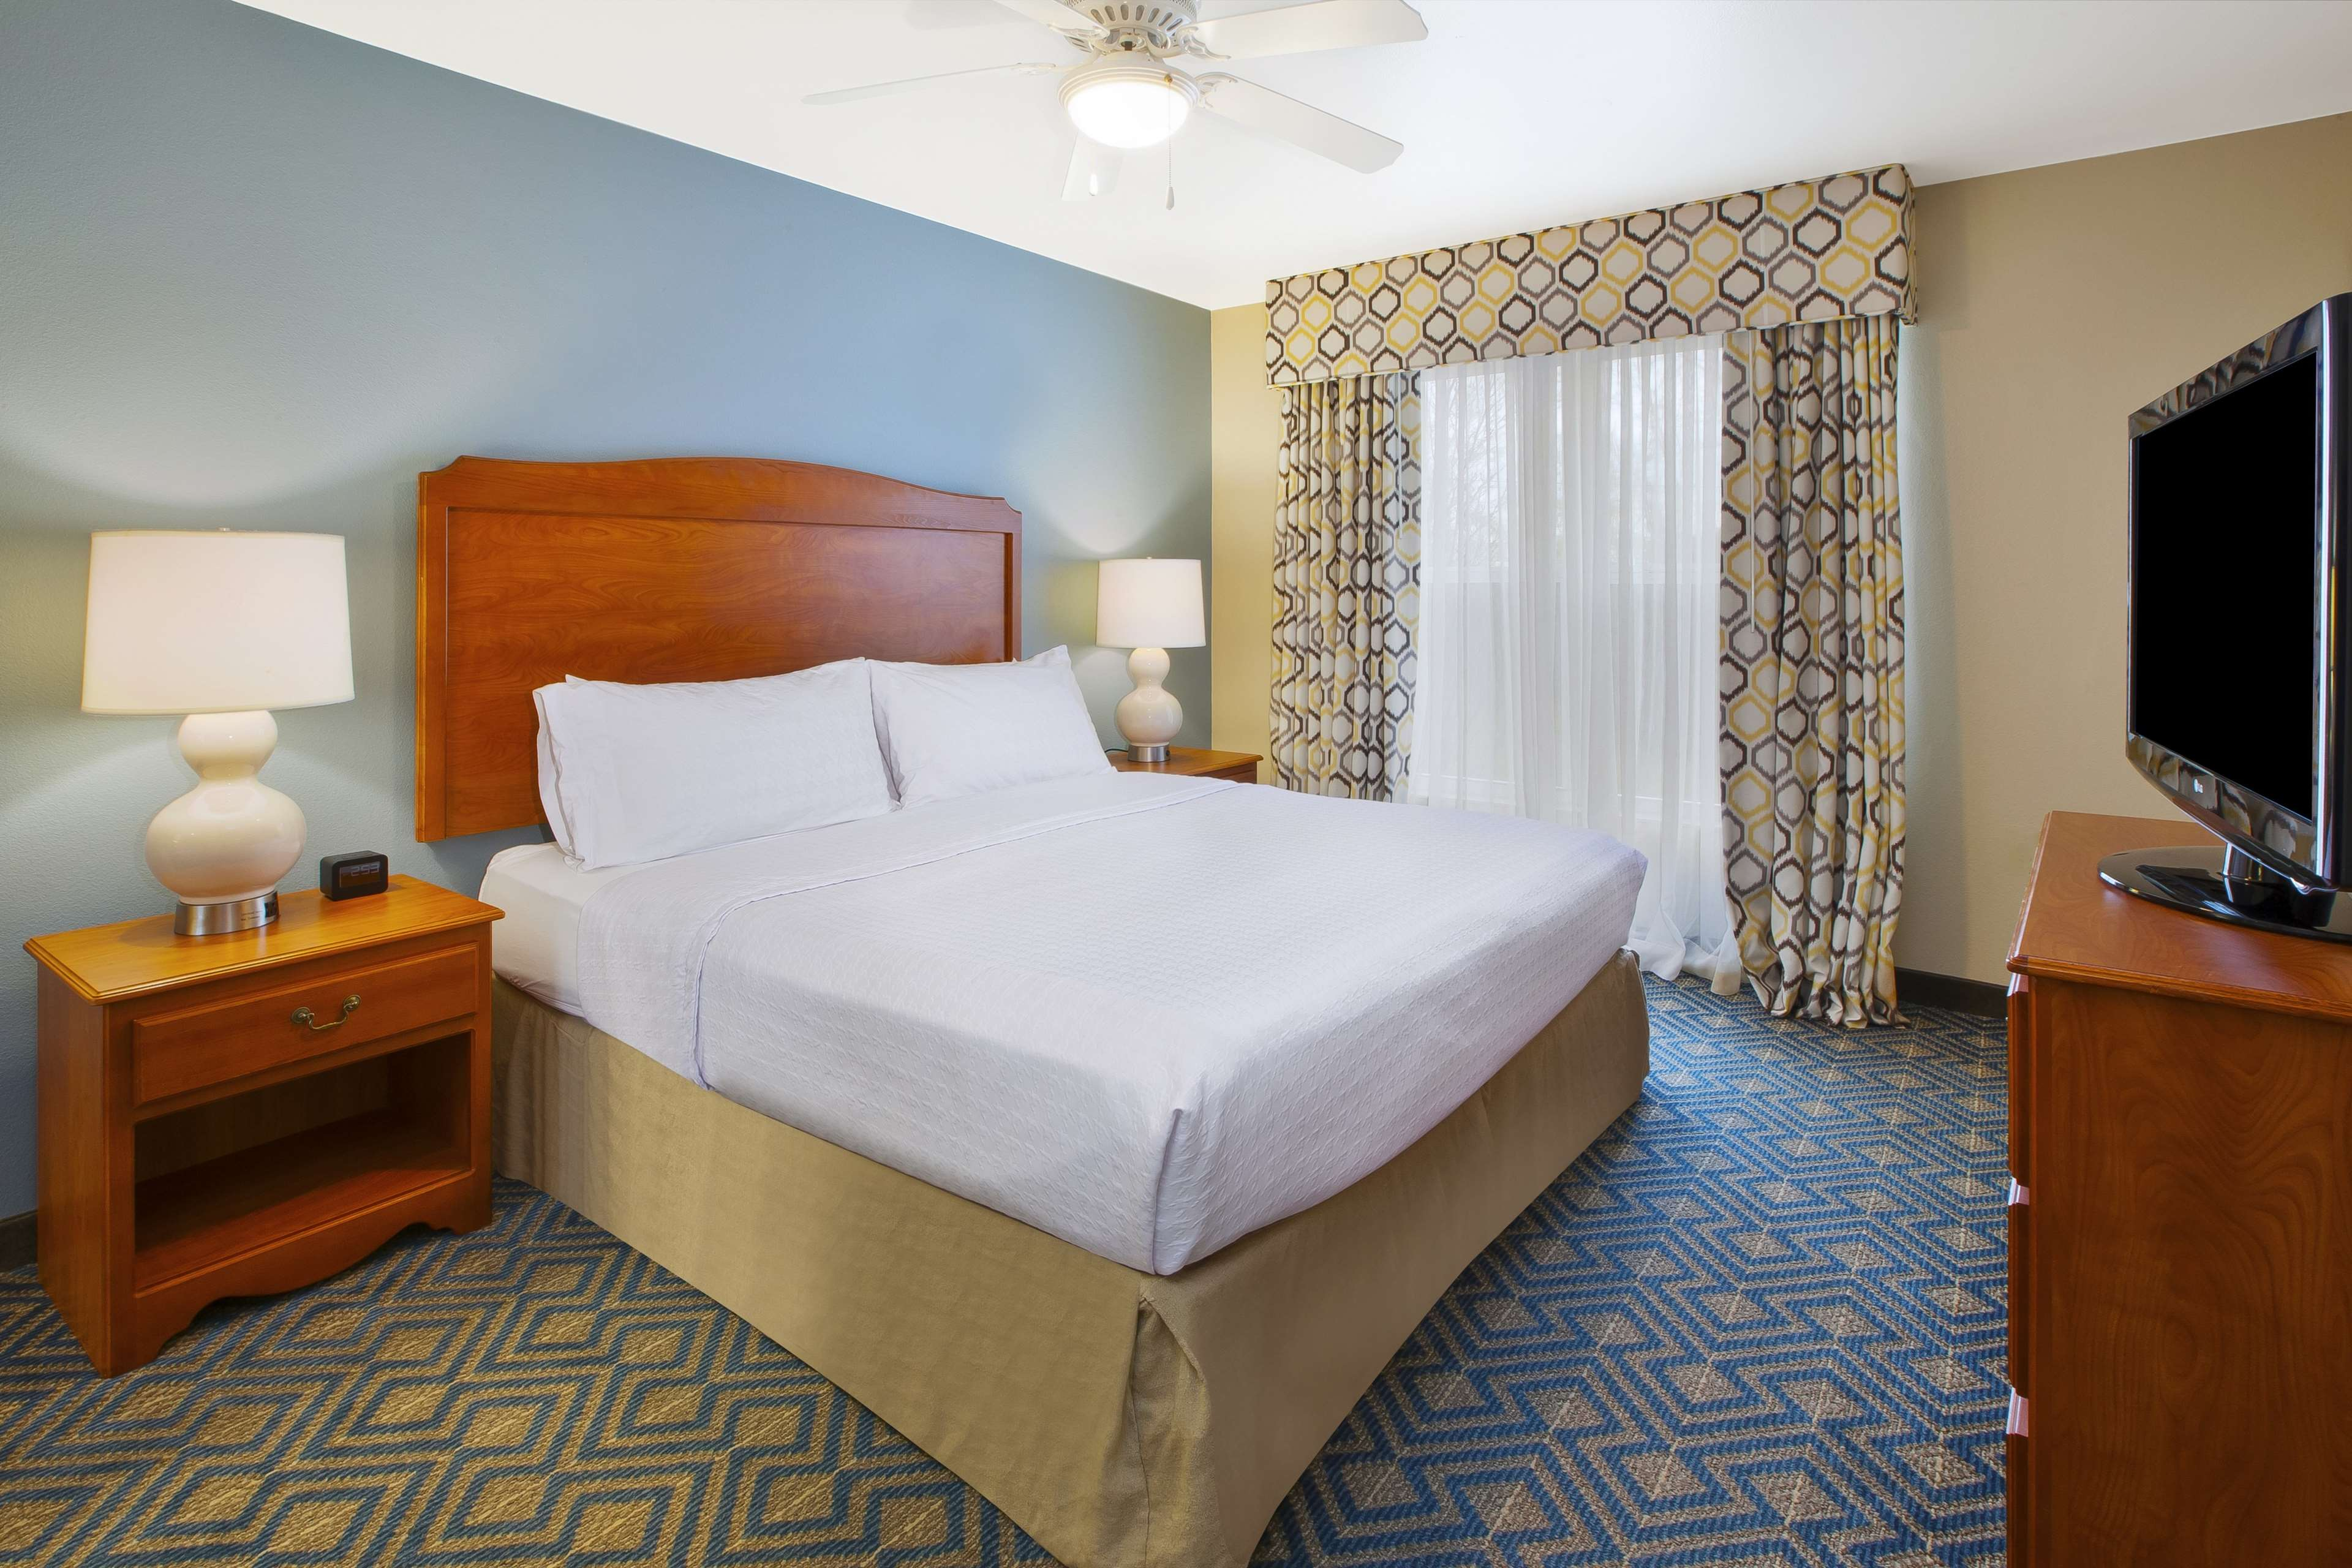 Homewood Suites by Hilton Philadelphia/Mt. Laurel image 17